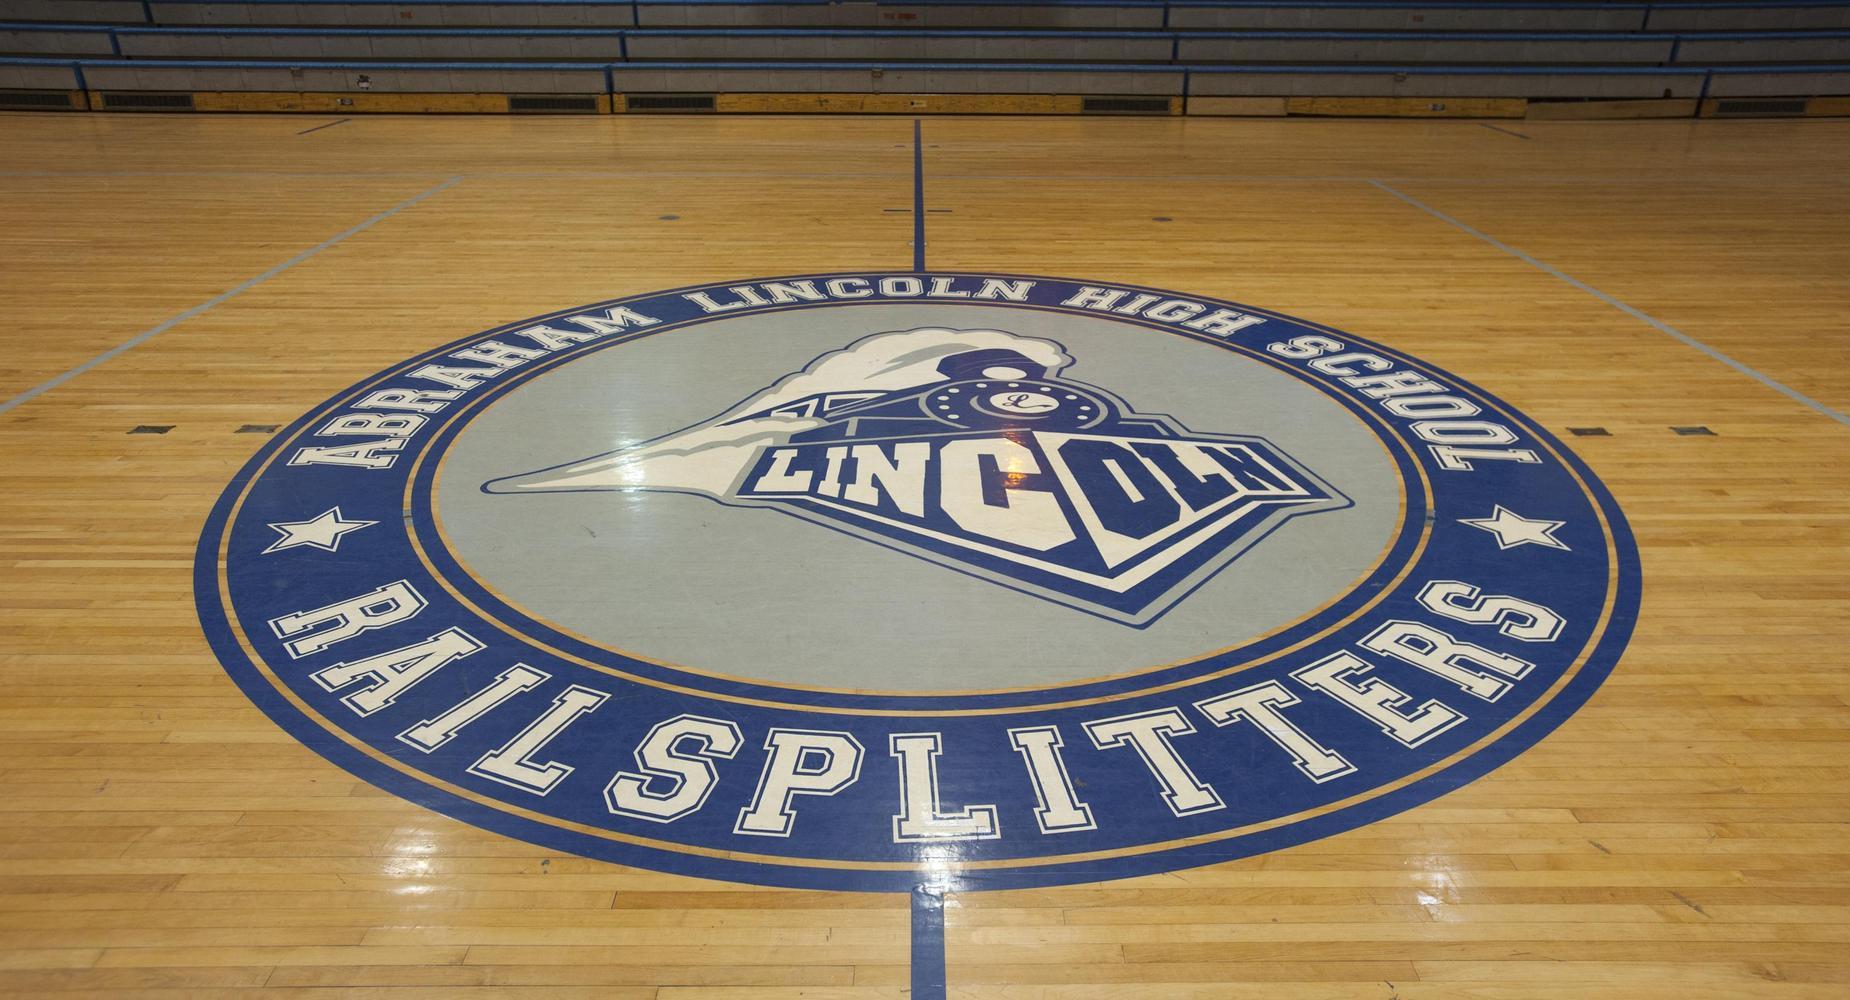 Abraham Lincoln High School Railsplitters gymnasium.